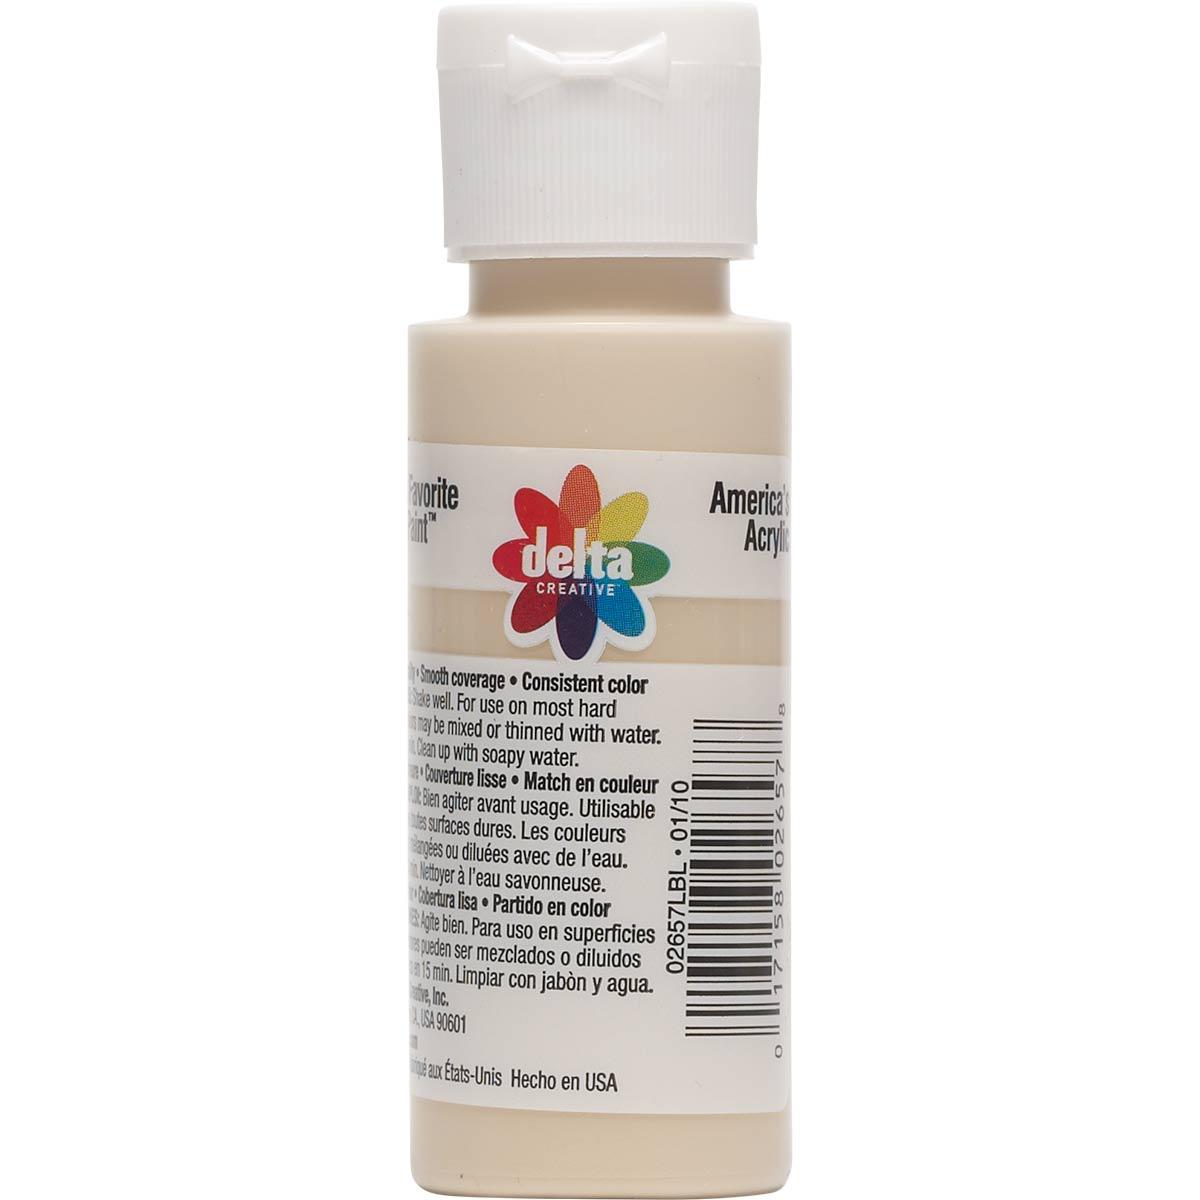 Delta Ceramcoat ® Acrylic Paint - Bamboo, 2 oz. - 026570202W